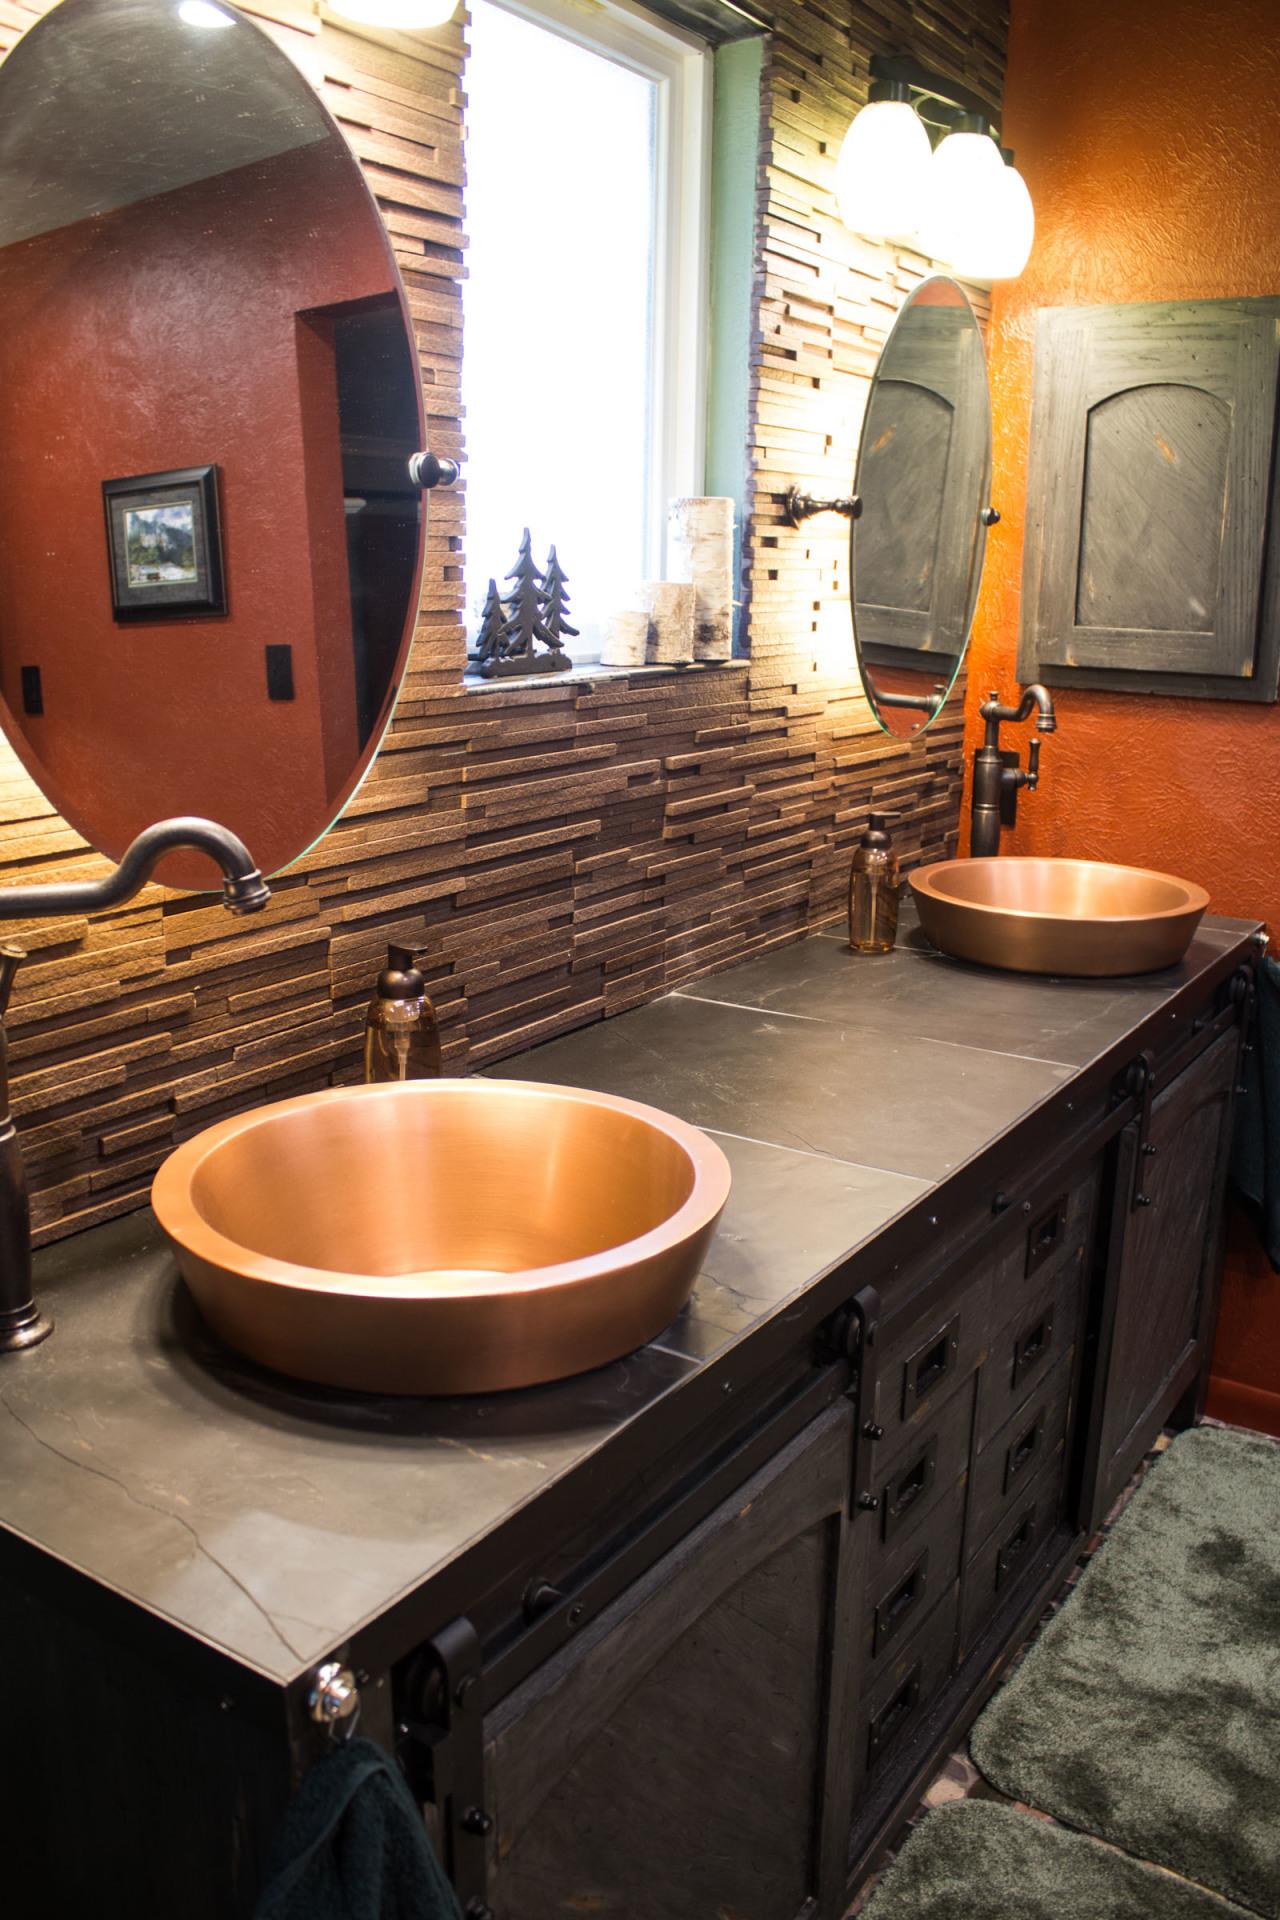 jarrell-signature-mountain-oasis-bathroom-remodel-11